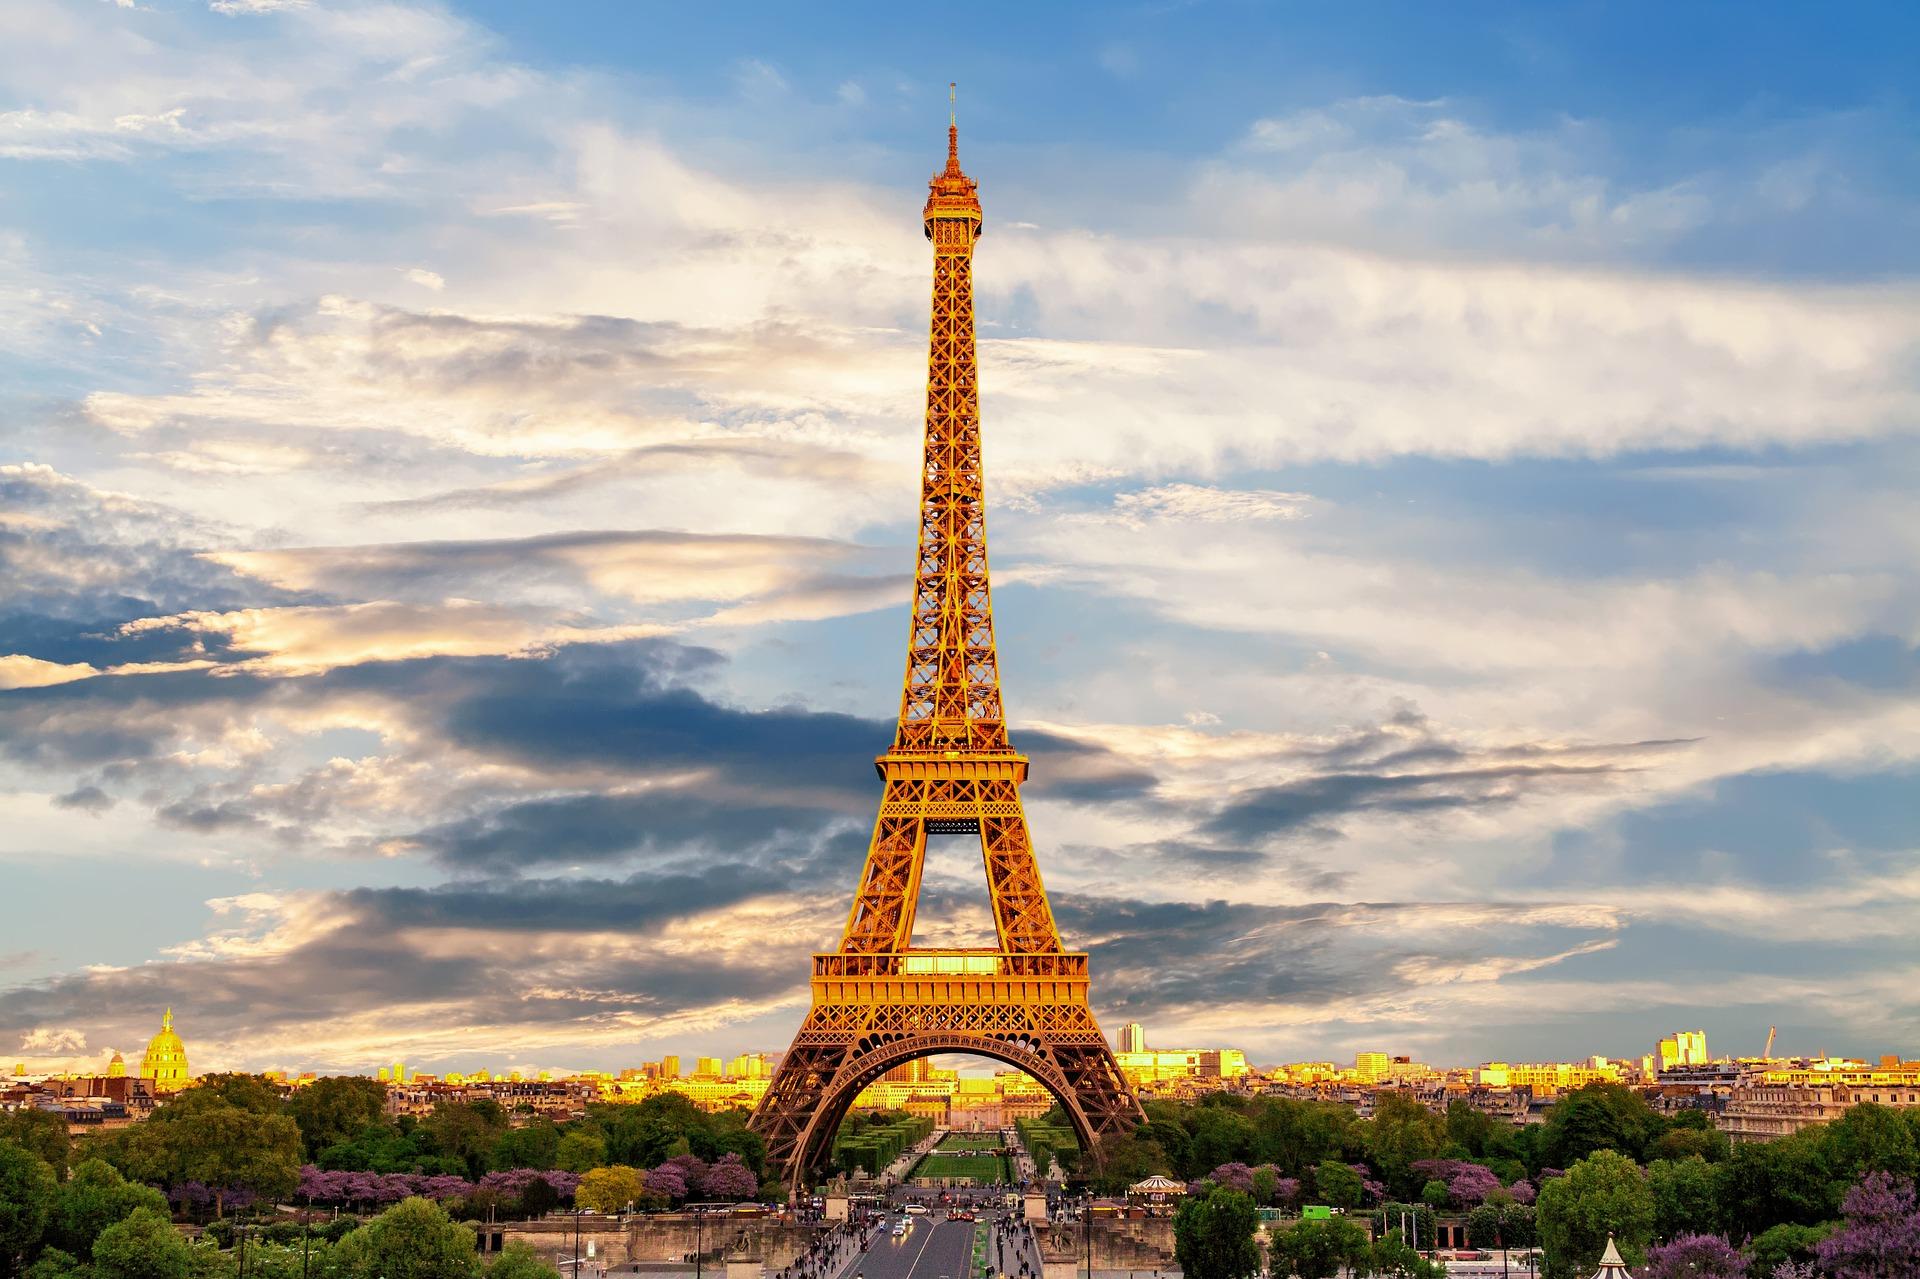 eiffel tower - معالم مشهورة حول العالم